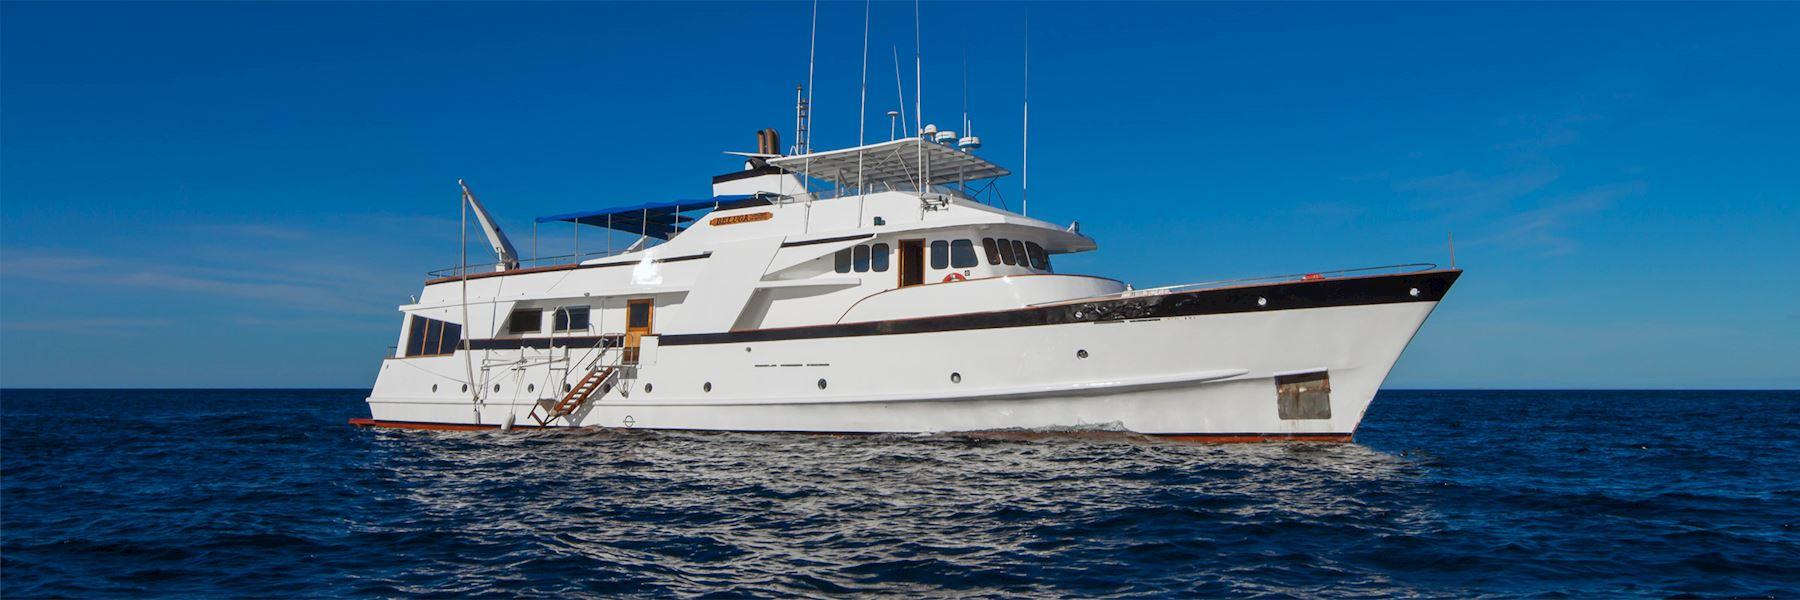 Cruise Ships in The Galapagos Islands: Beluga